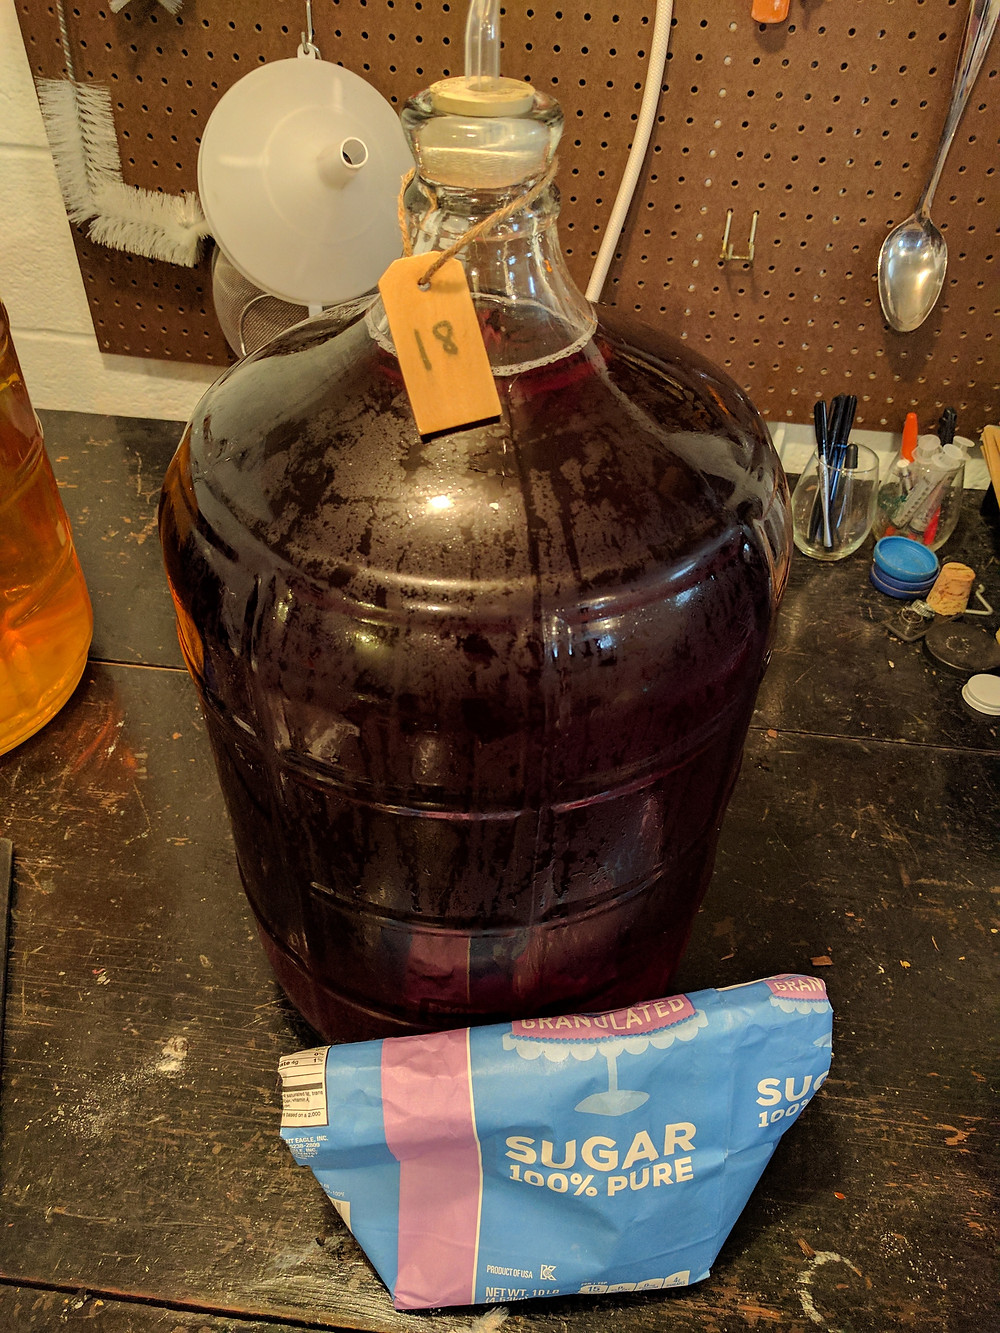 Adding Sugar to Wine